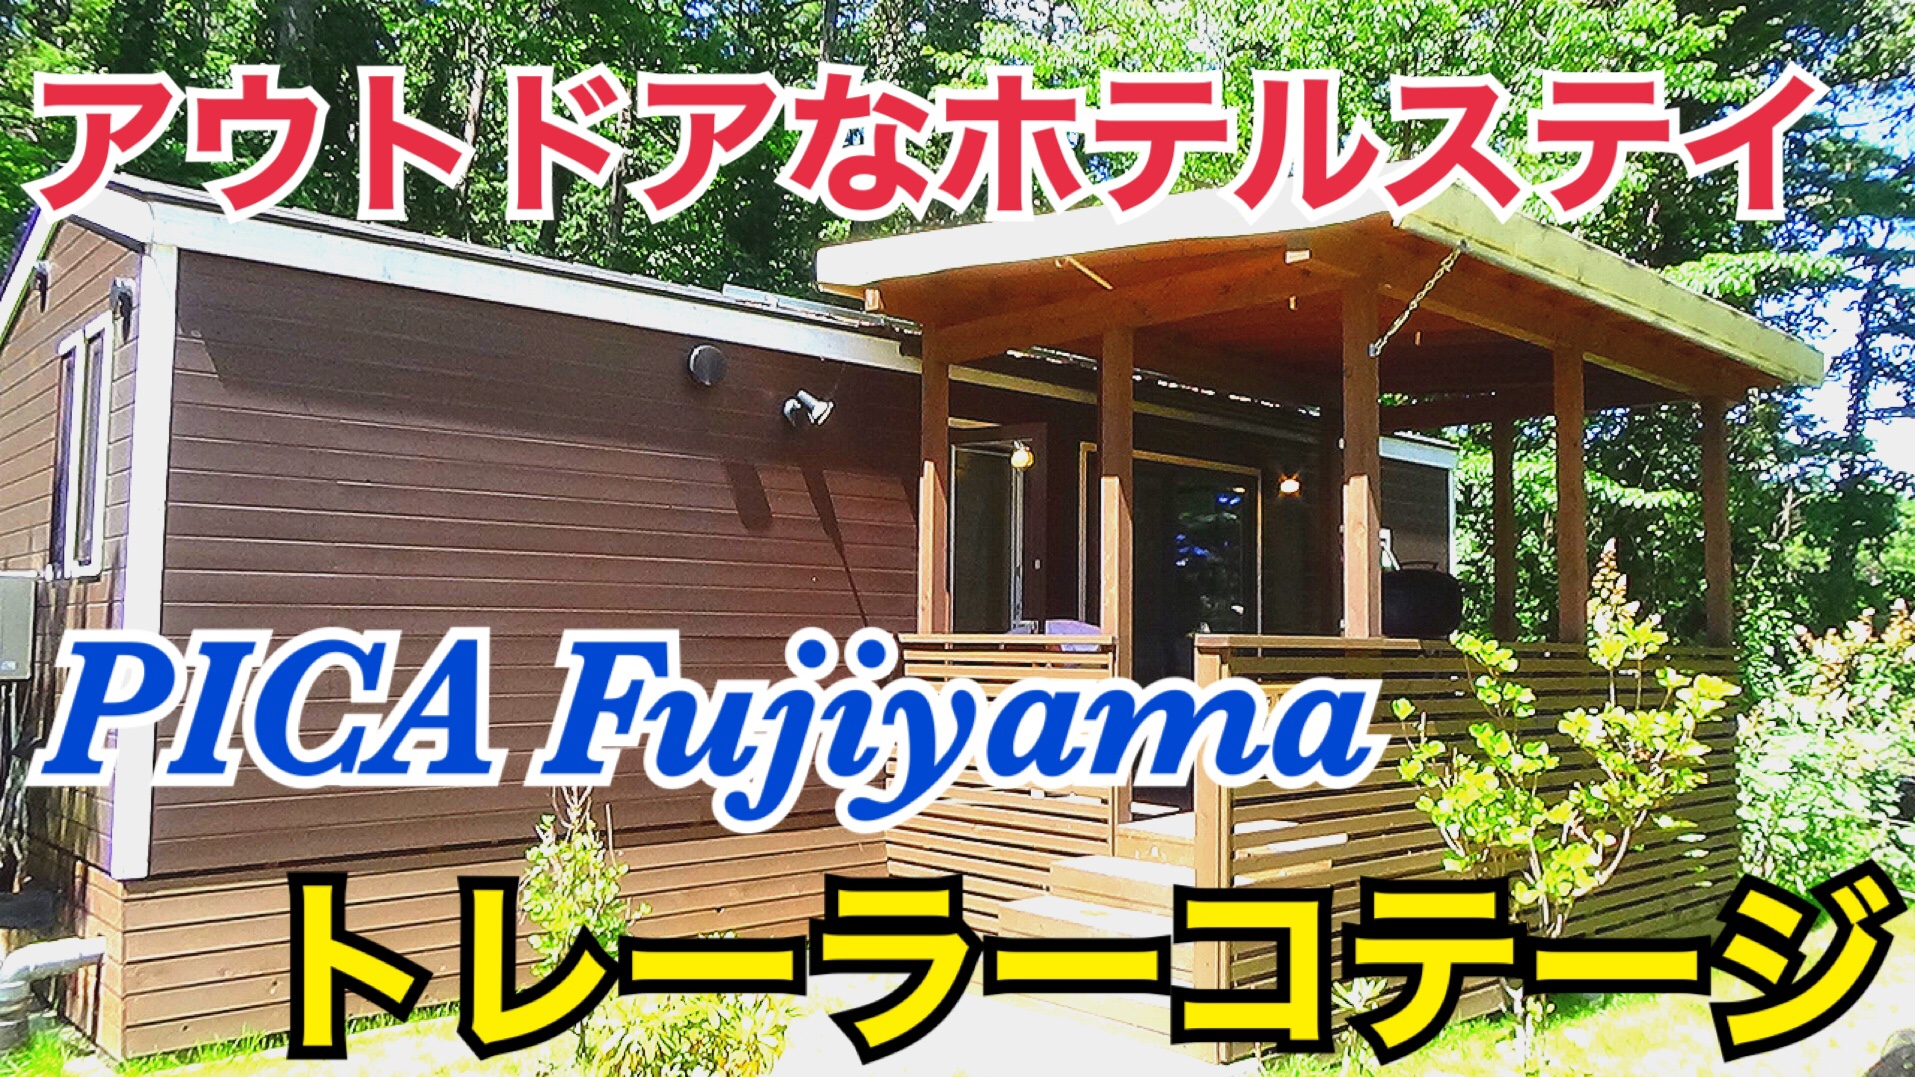 【Go To トラベル支援対象】手軽にキャンプ気分!PICA Fujiyama のトレーラーコテージ宿泊記